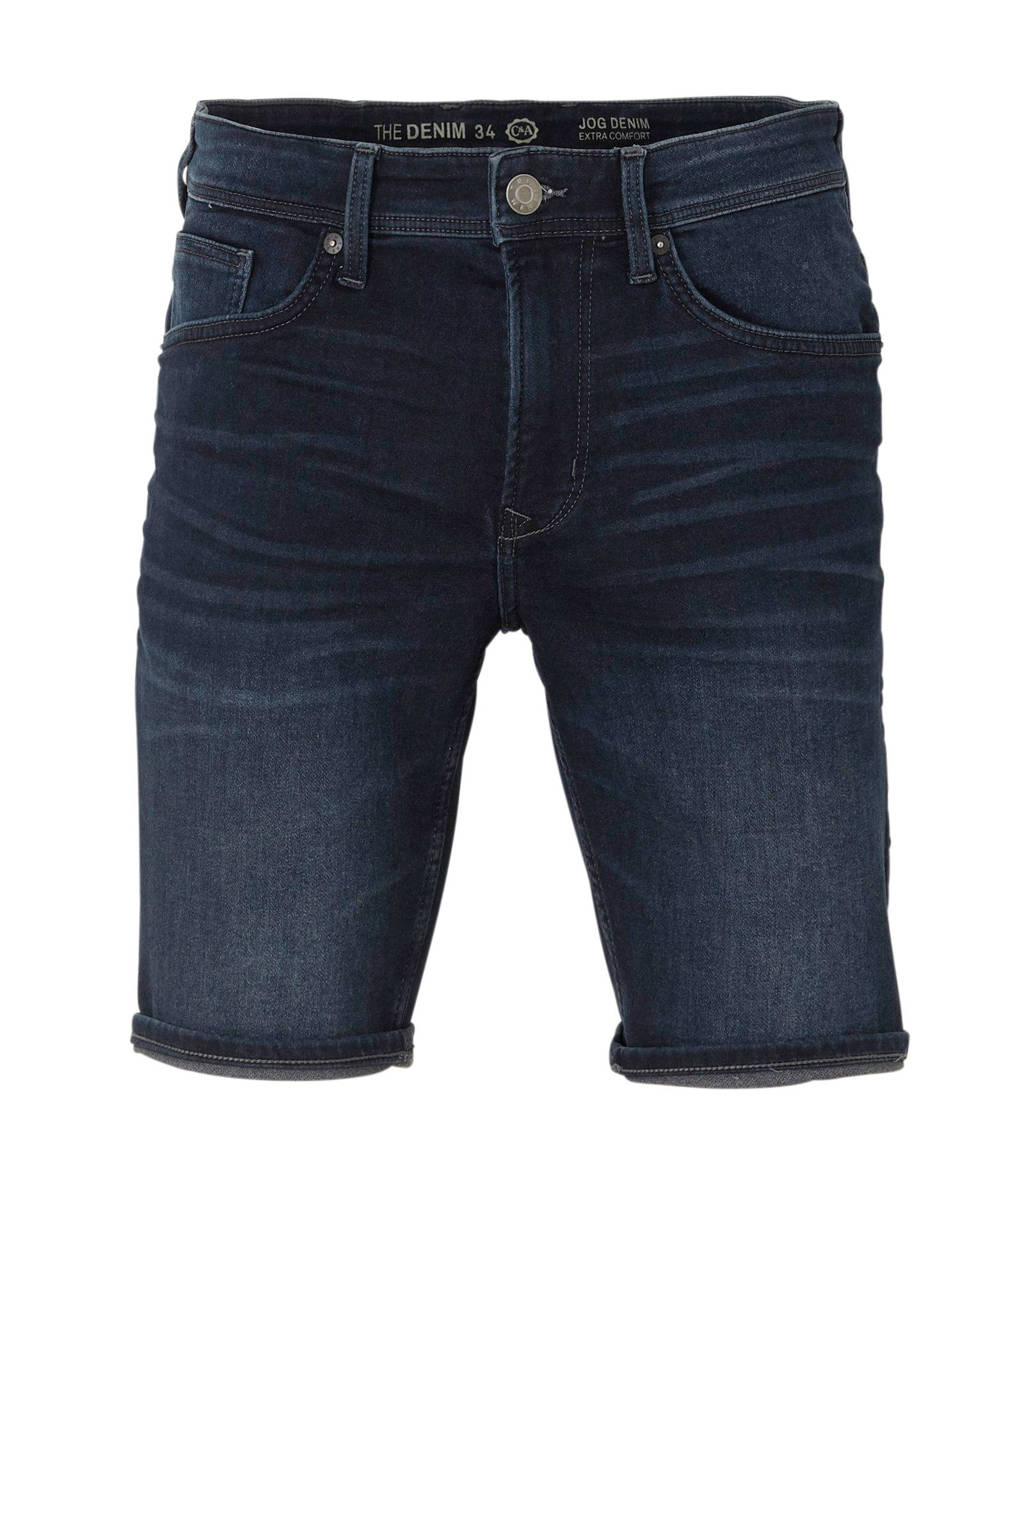 C&A The Denim regular fit denim jeans short, Donkerblauw